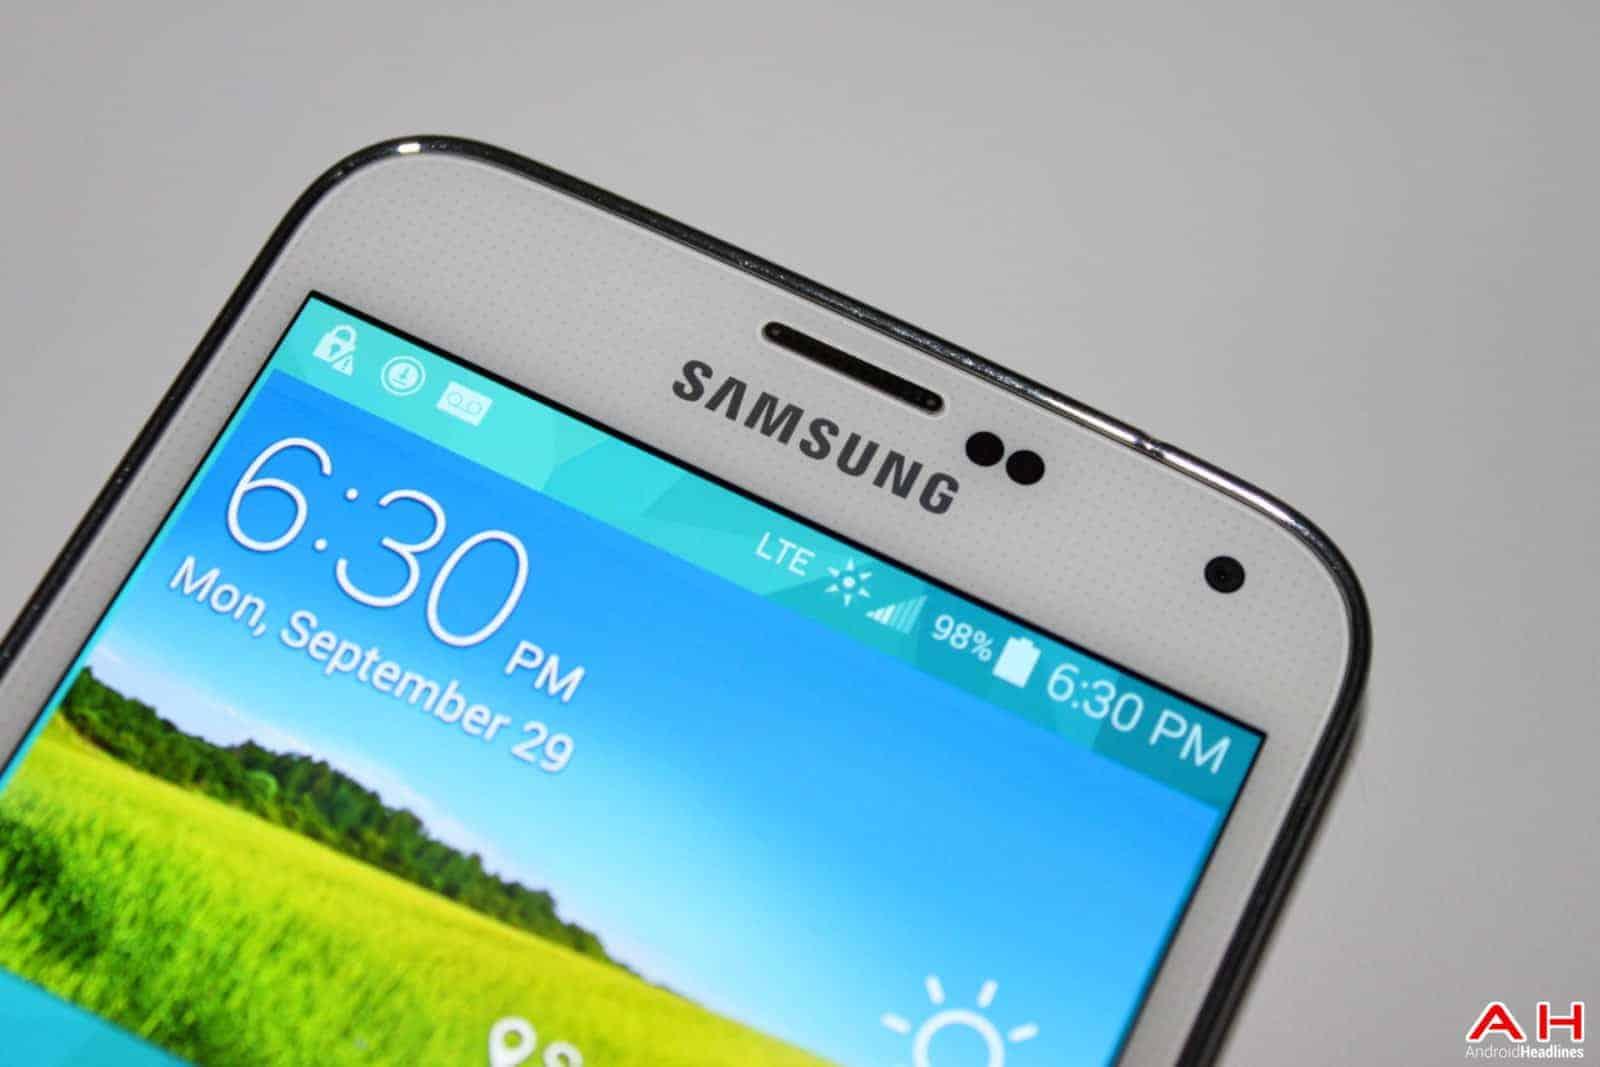 AH Samsung Galaxy S5 -12 LOGO